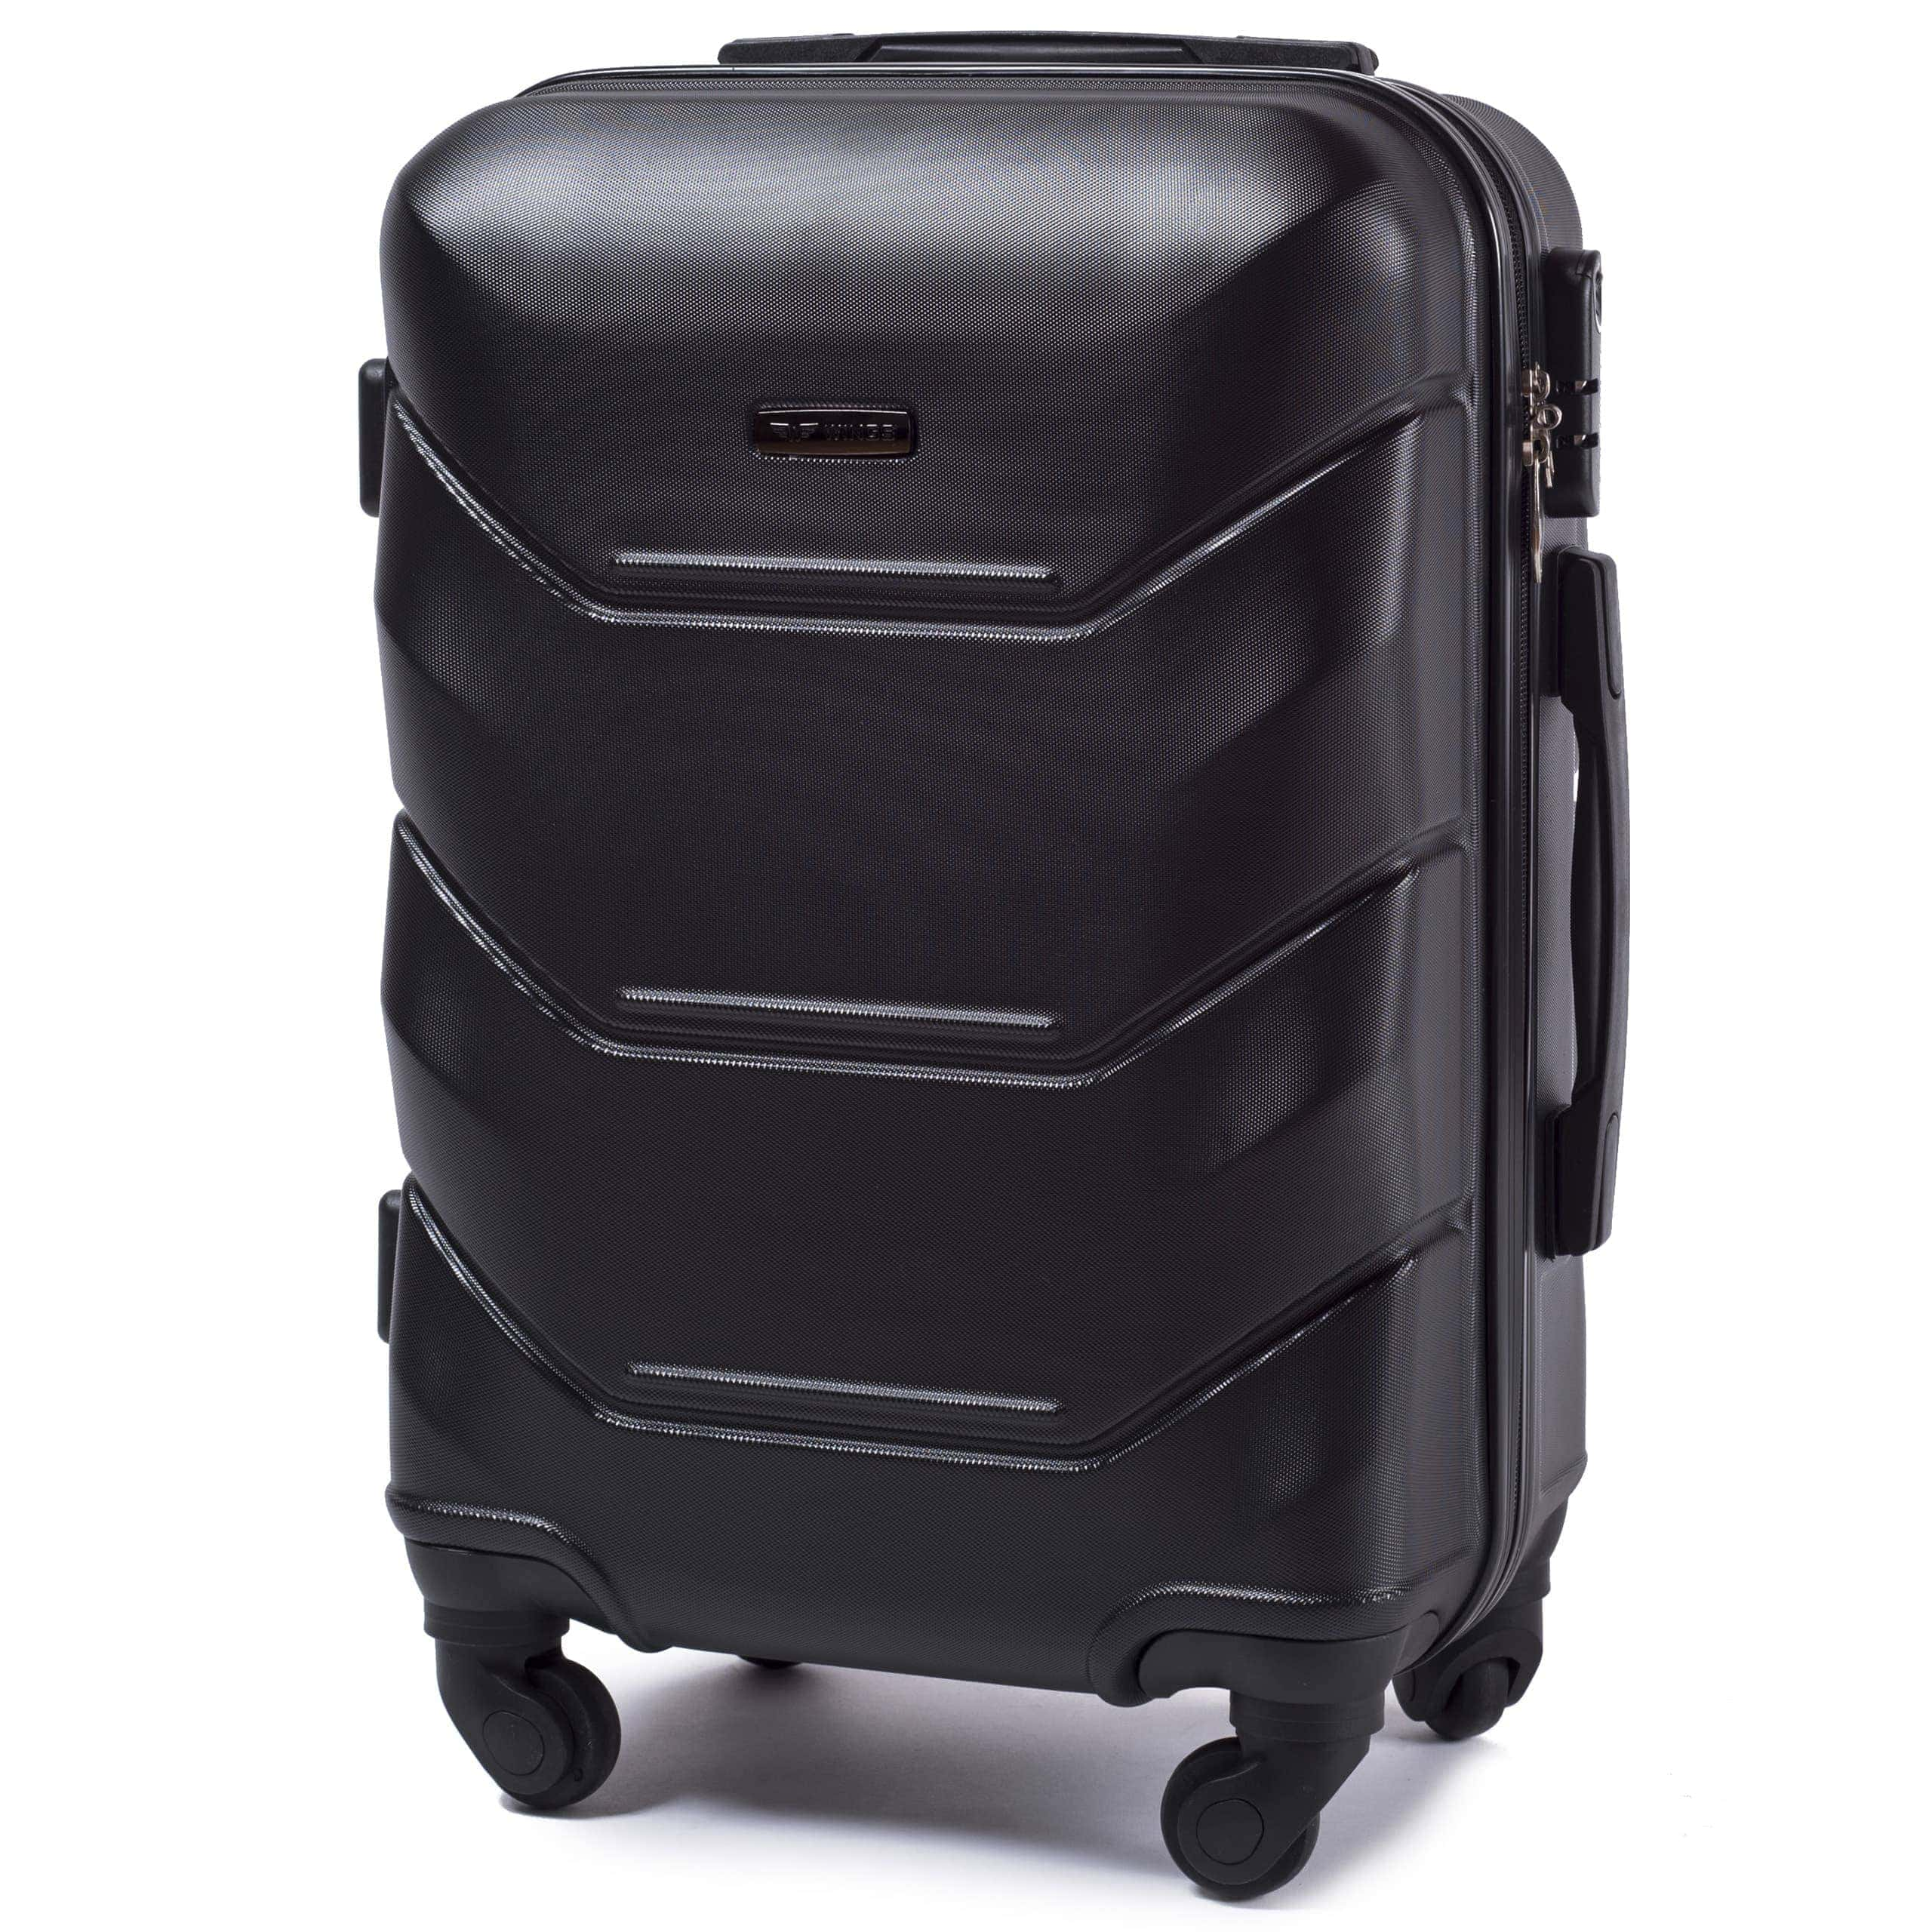 Valiza mica WINGS 147 S BLACK Premium pe 4 roti din cauciuc!Pt bagaj,pina la 7/10 kg